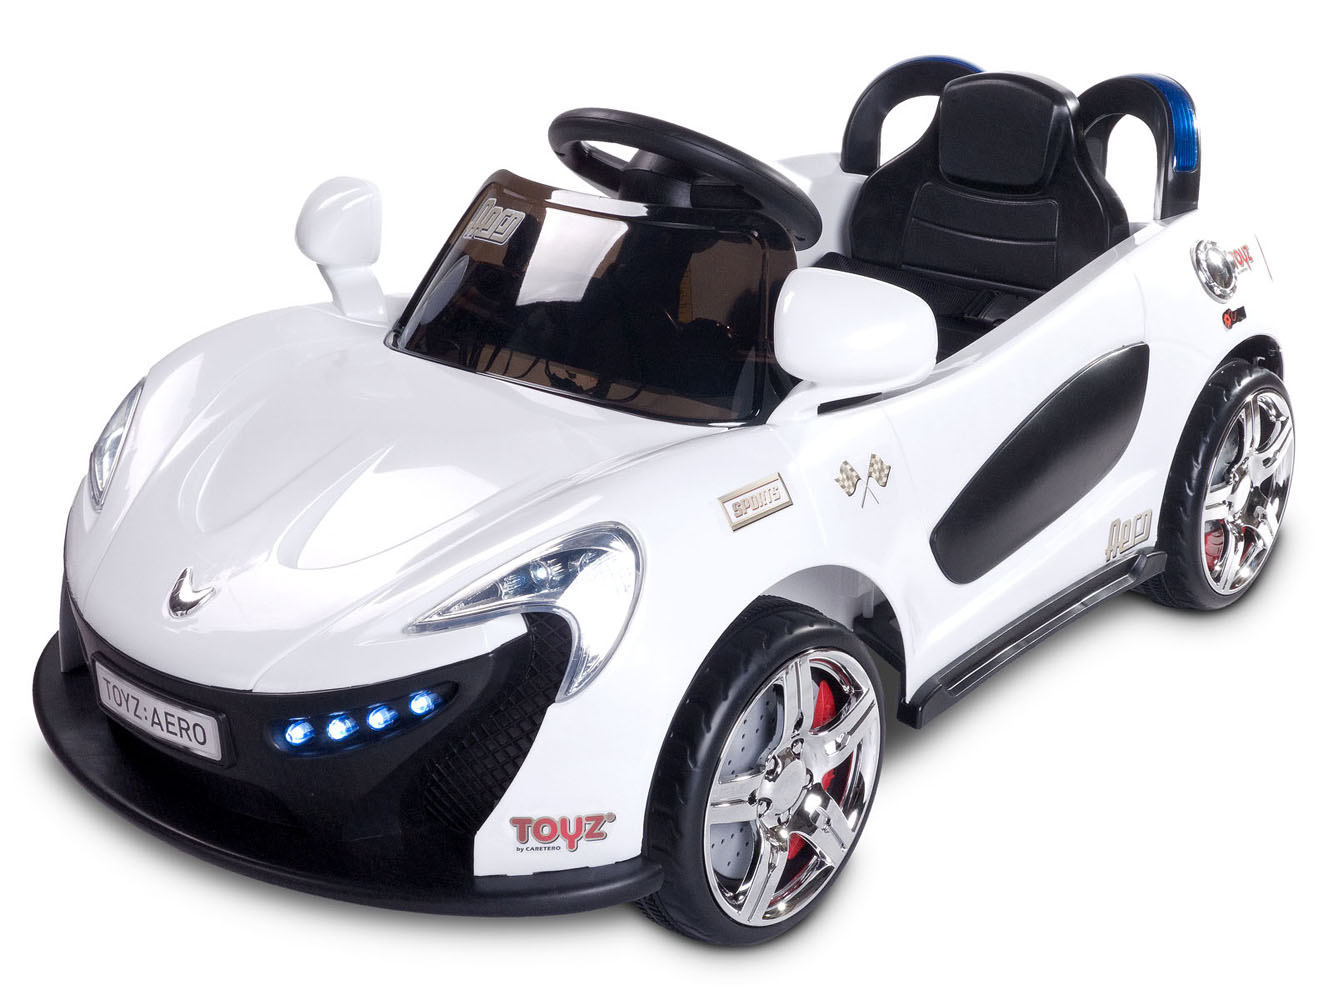 Dětské auto TOYZ Aero white na baterii Elektrické autíčko pro děti Toyz